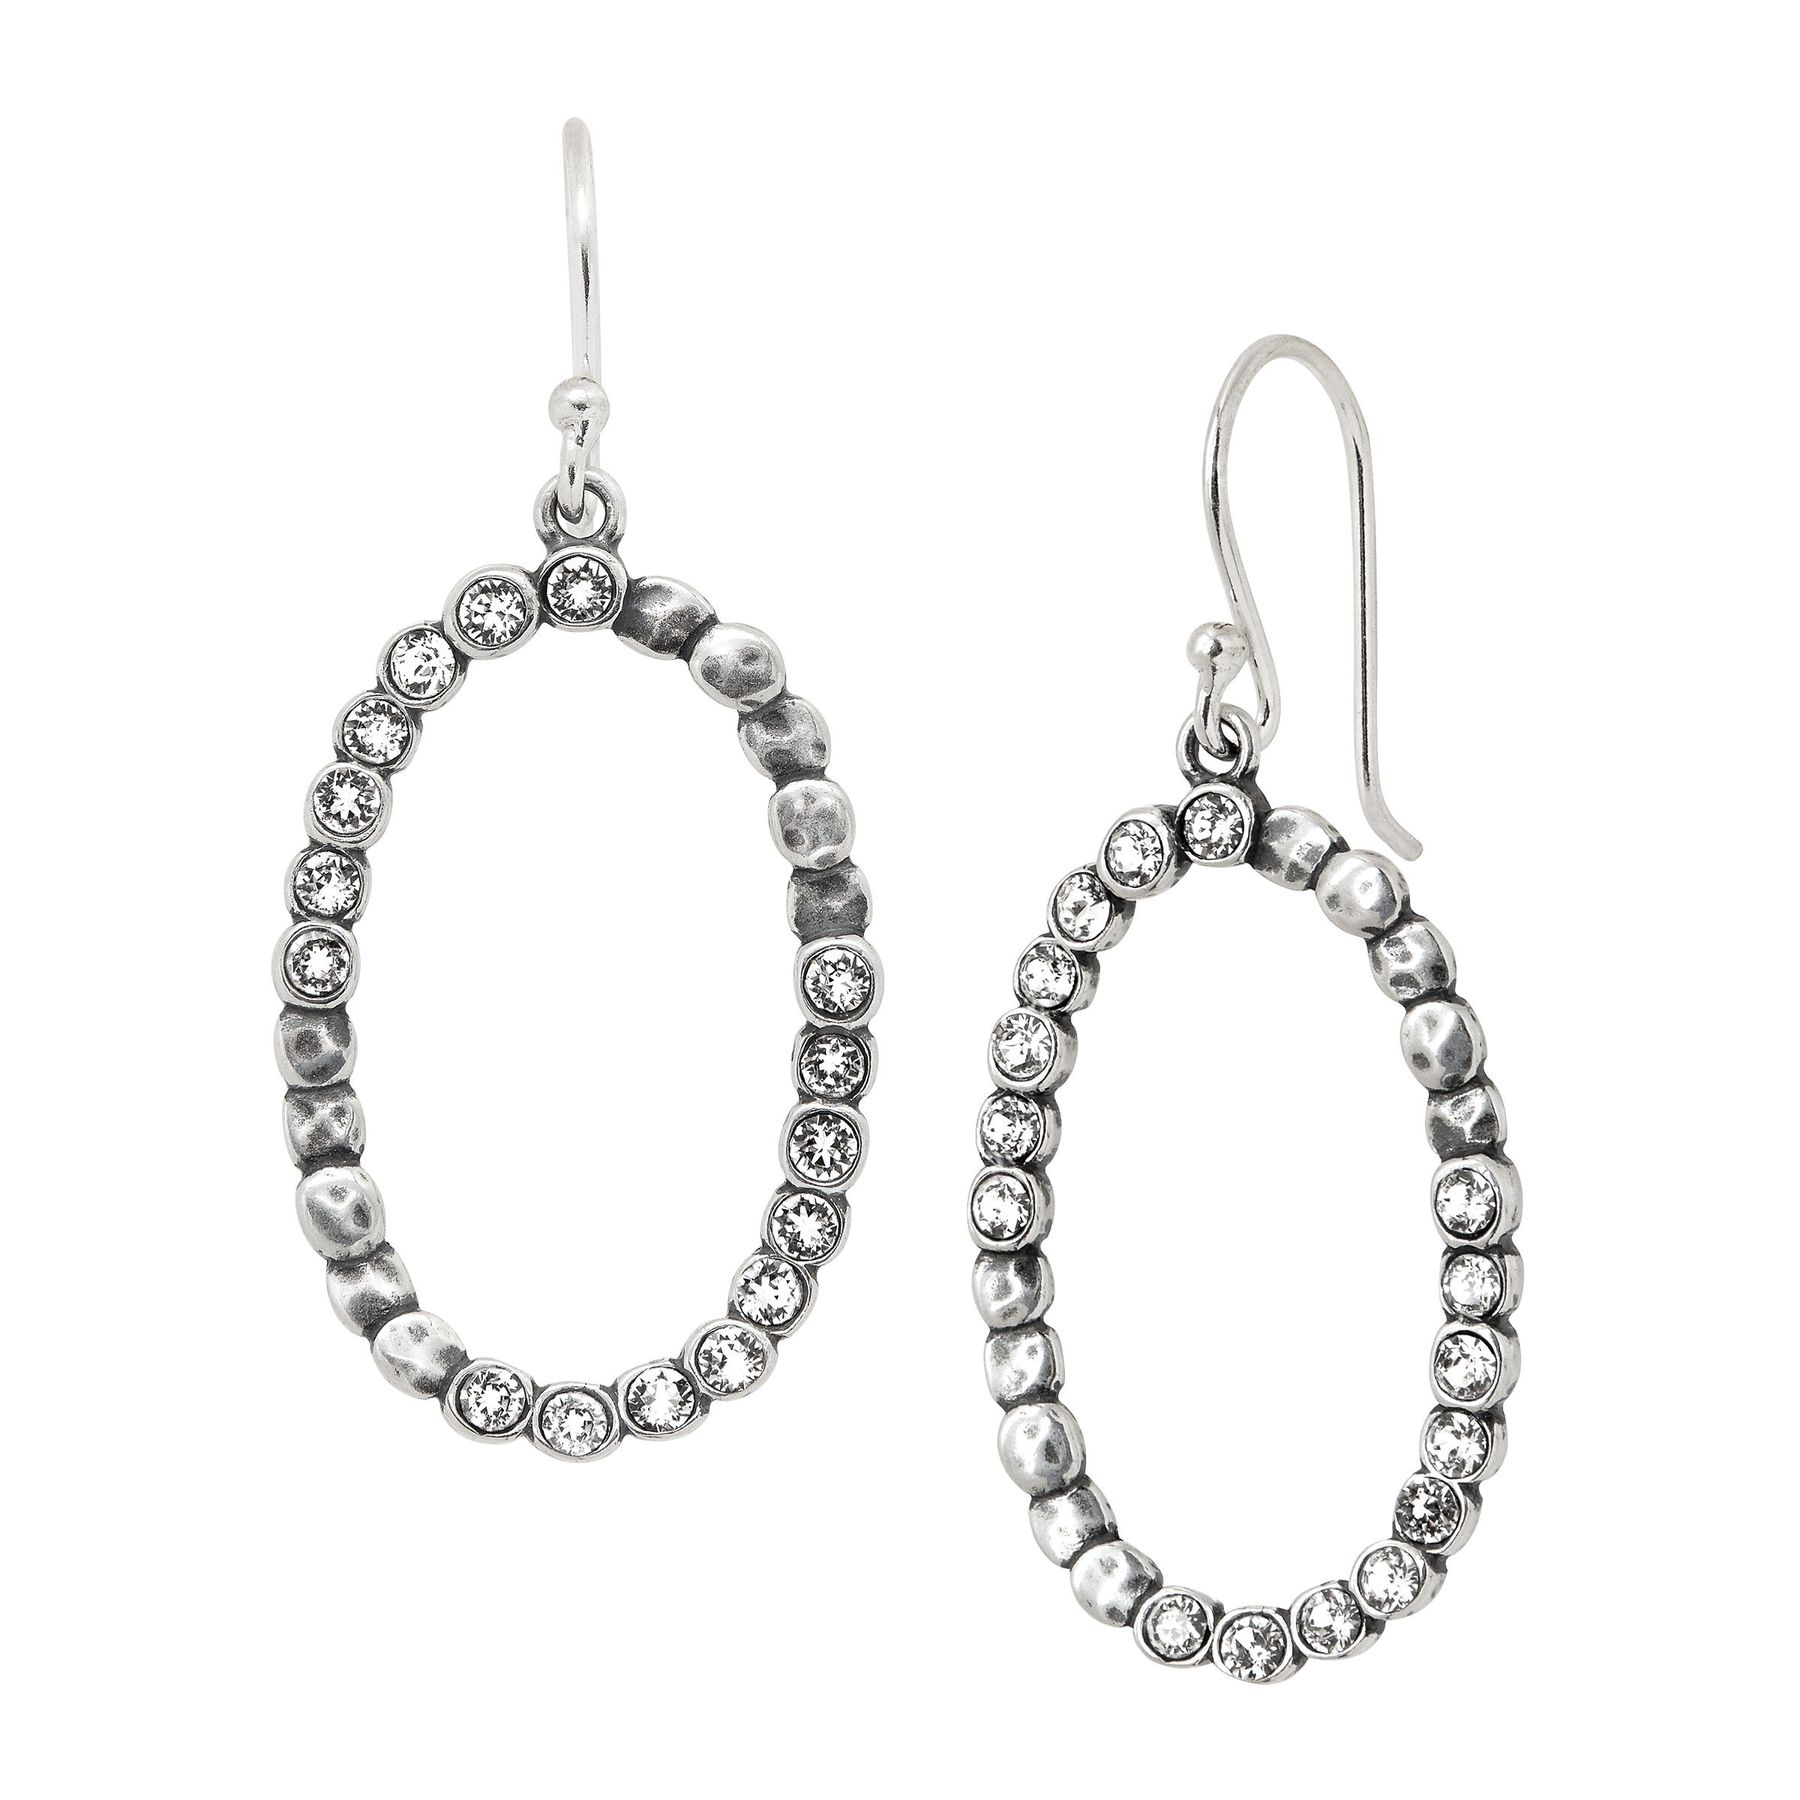 e0ecc8136 Silpada 'Oval Glitz' Beaded Open Drop Earrings with Swarovski Crystals in  Sterling Silver | Oval Glitz Drop Earrings | Silpada